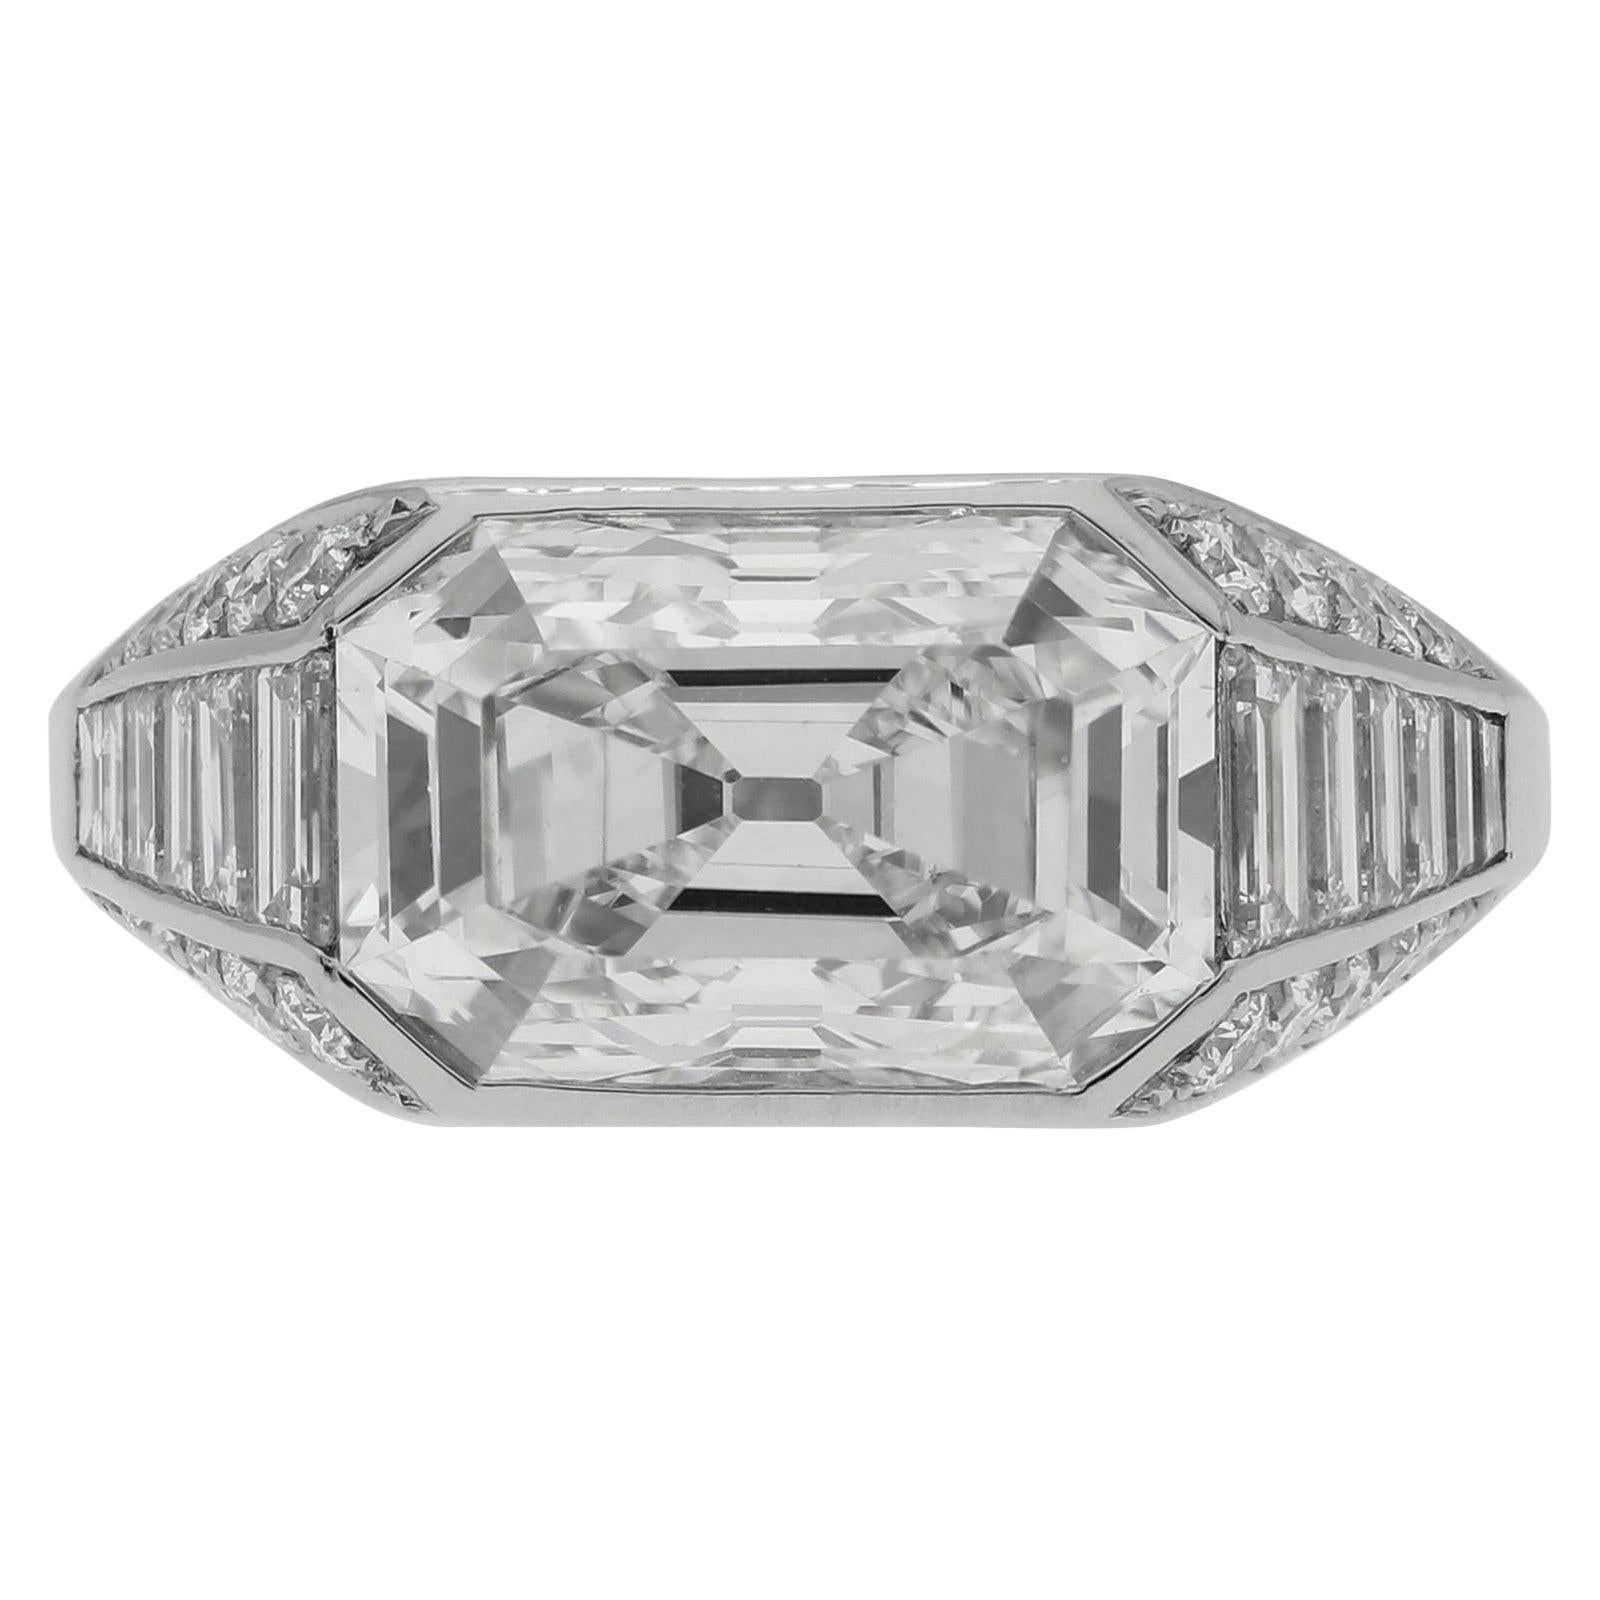 Hancocks 4.25 Carat G VS1 Old Mine Step Cut Diamond & Platinum Ring